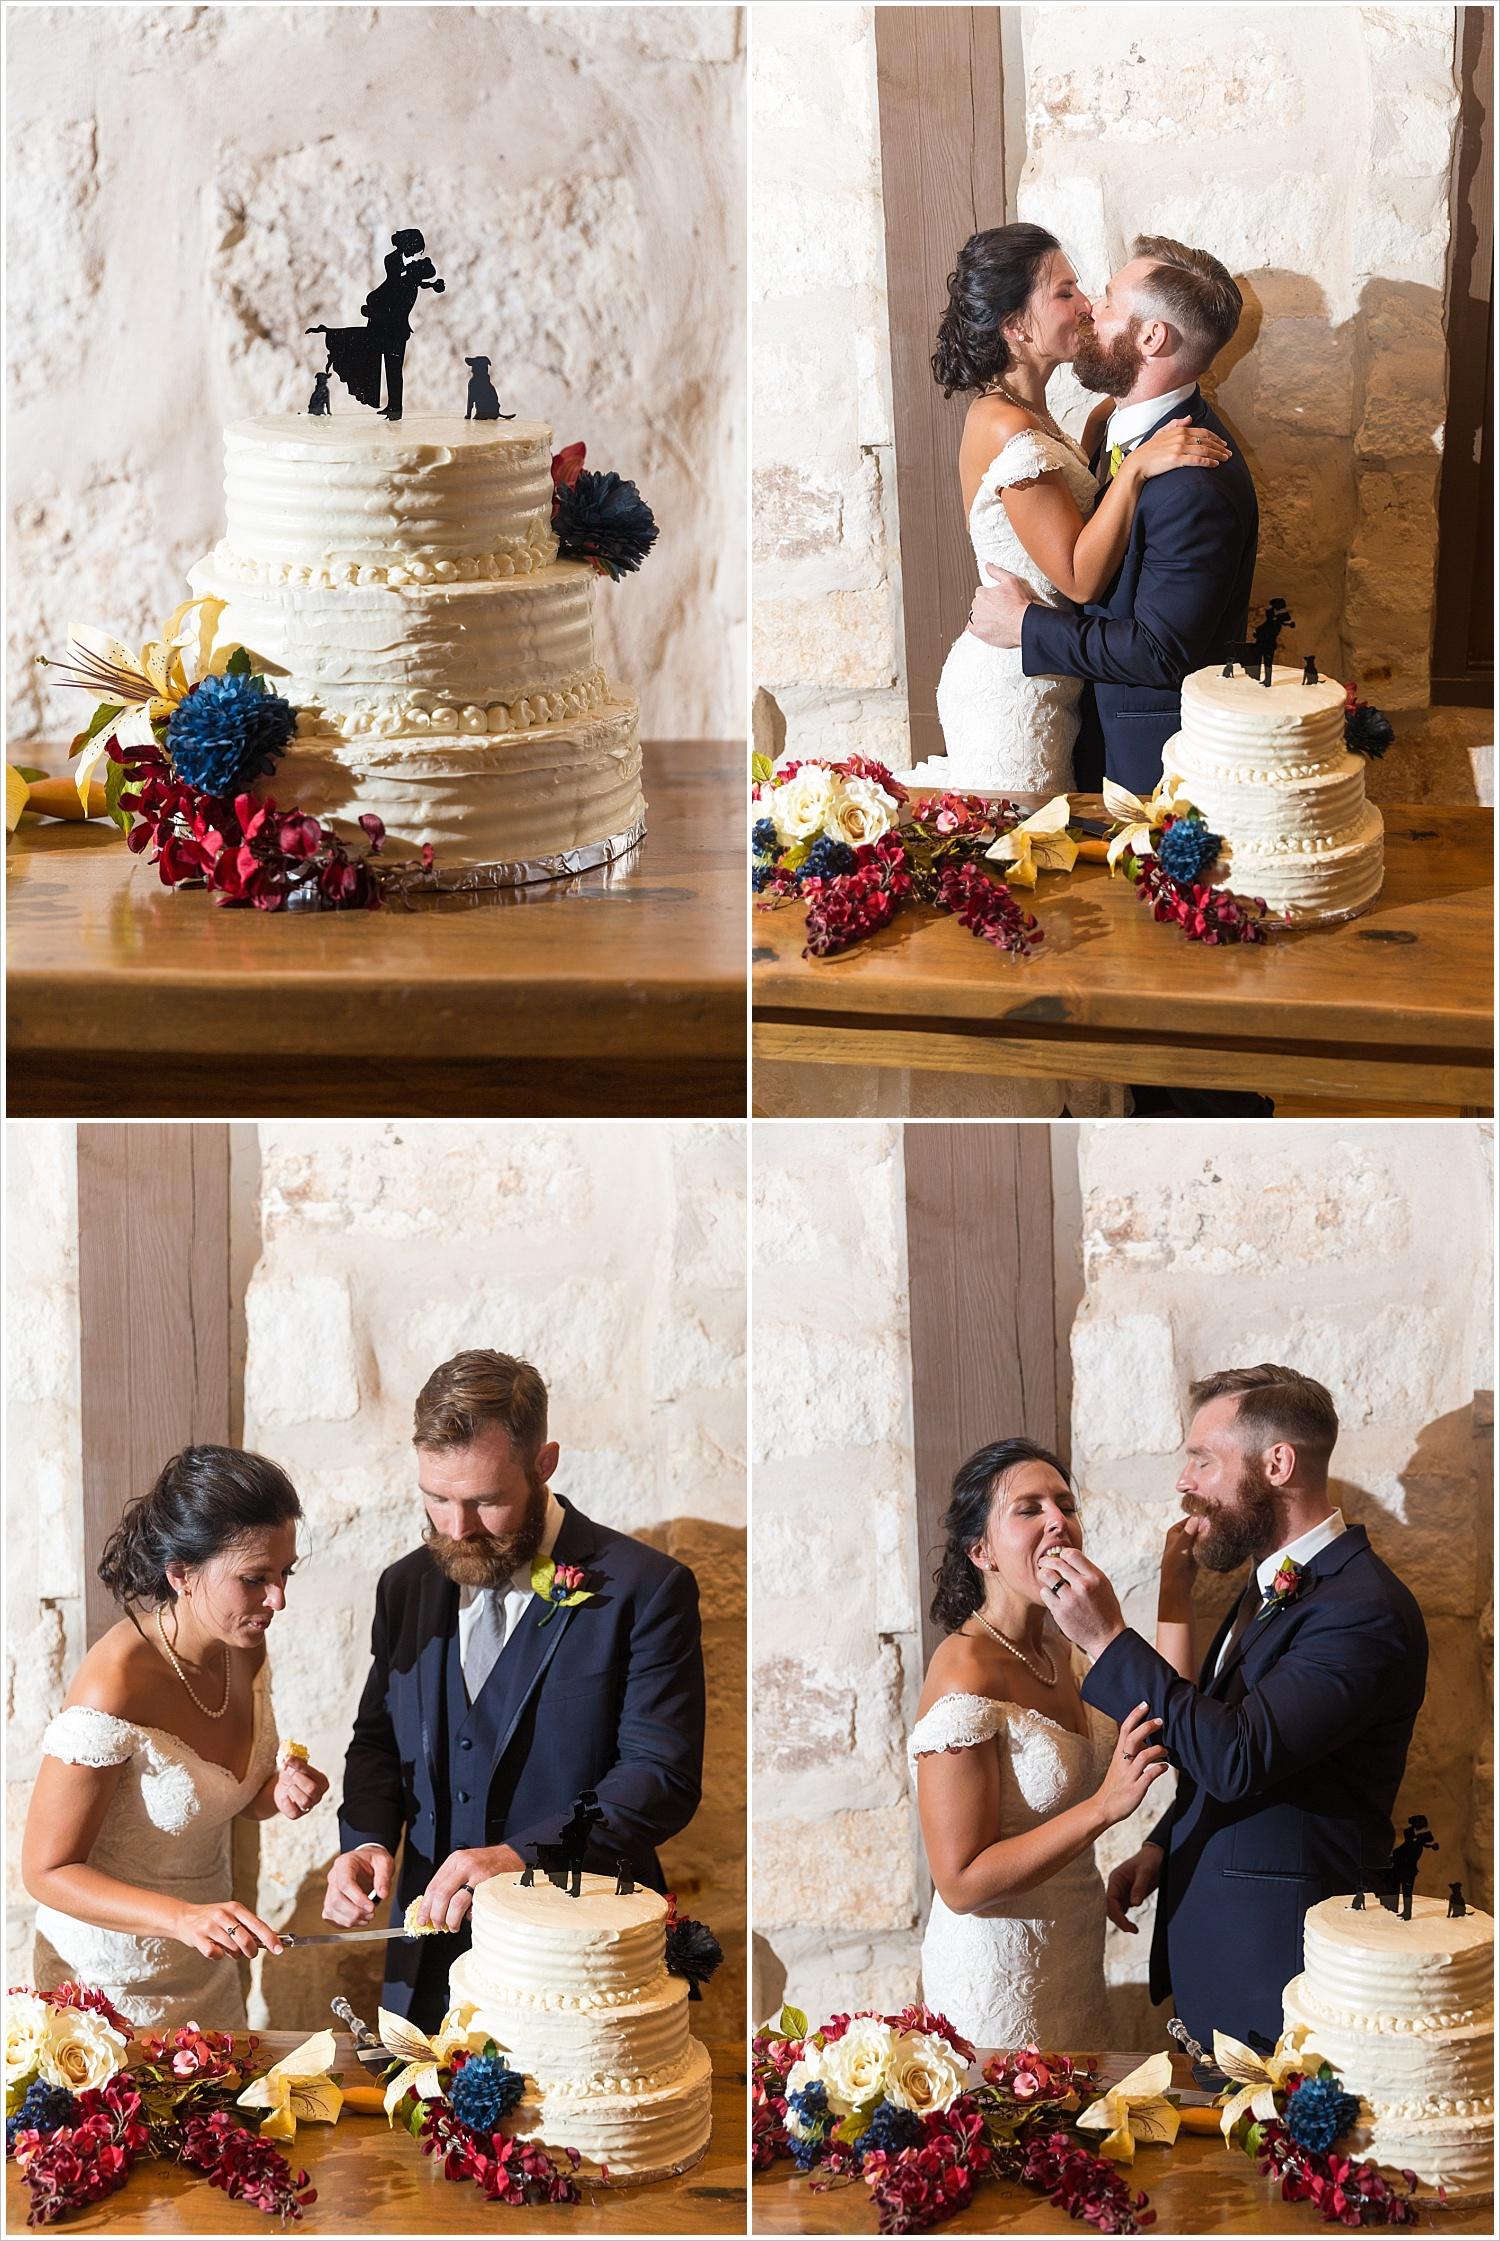 McKinney-Texas-Wedding-The-Springs-Jason&Melaina-Photography_0002.jpg